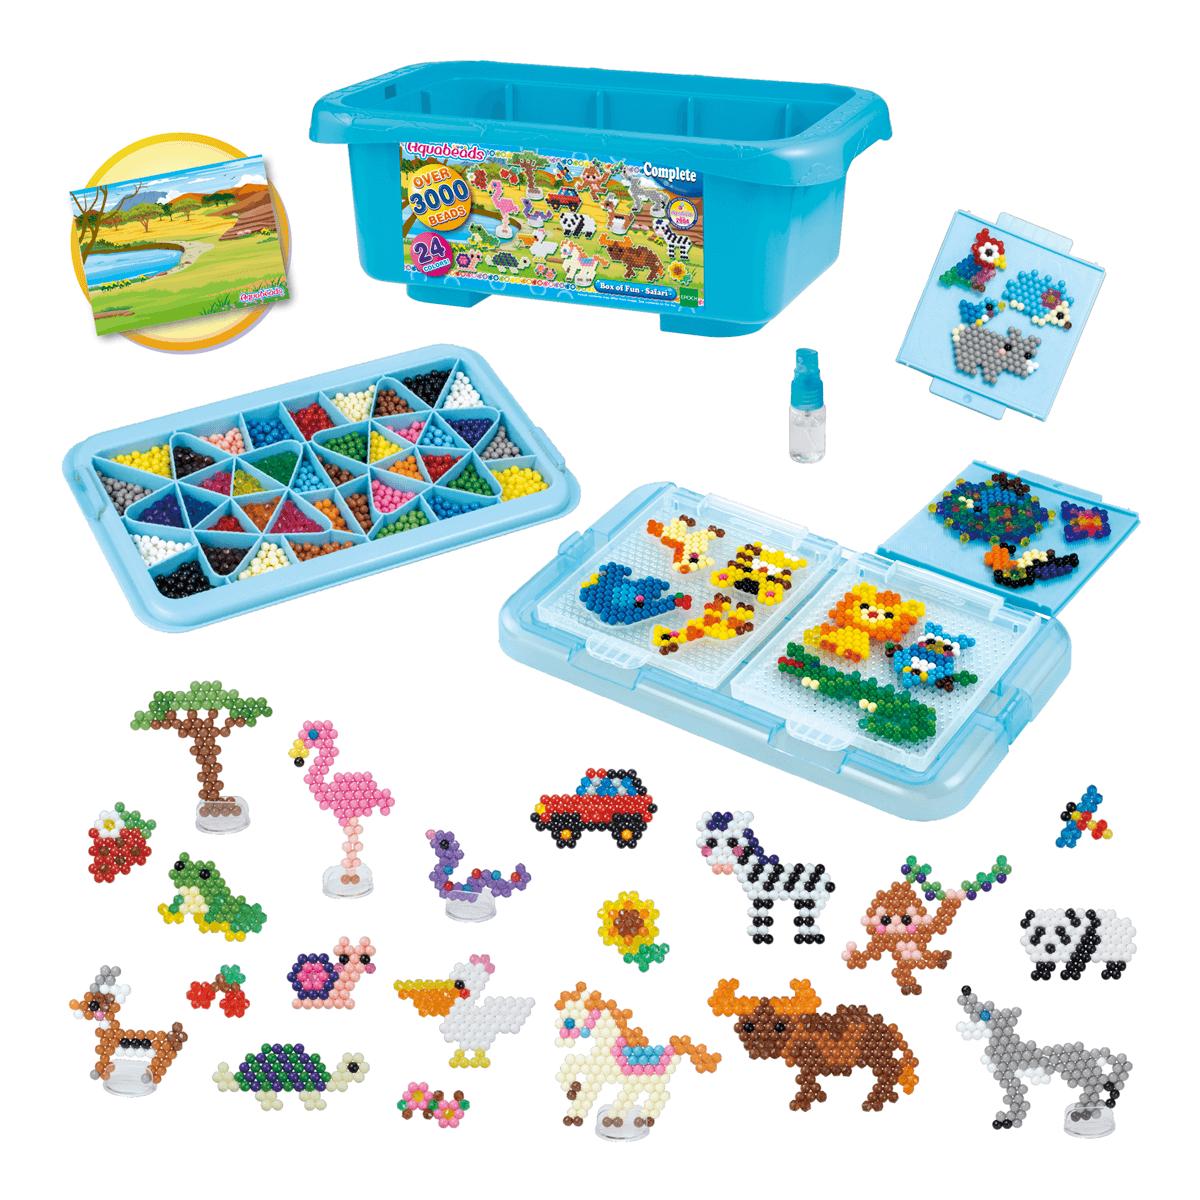 Kit Combo Aquabeads Caixa Safari + Conjunto Beads Brilhantes  - Game Land Brinquedos